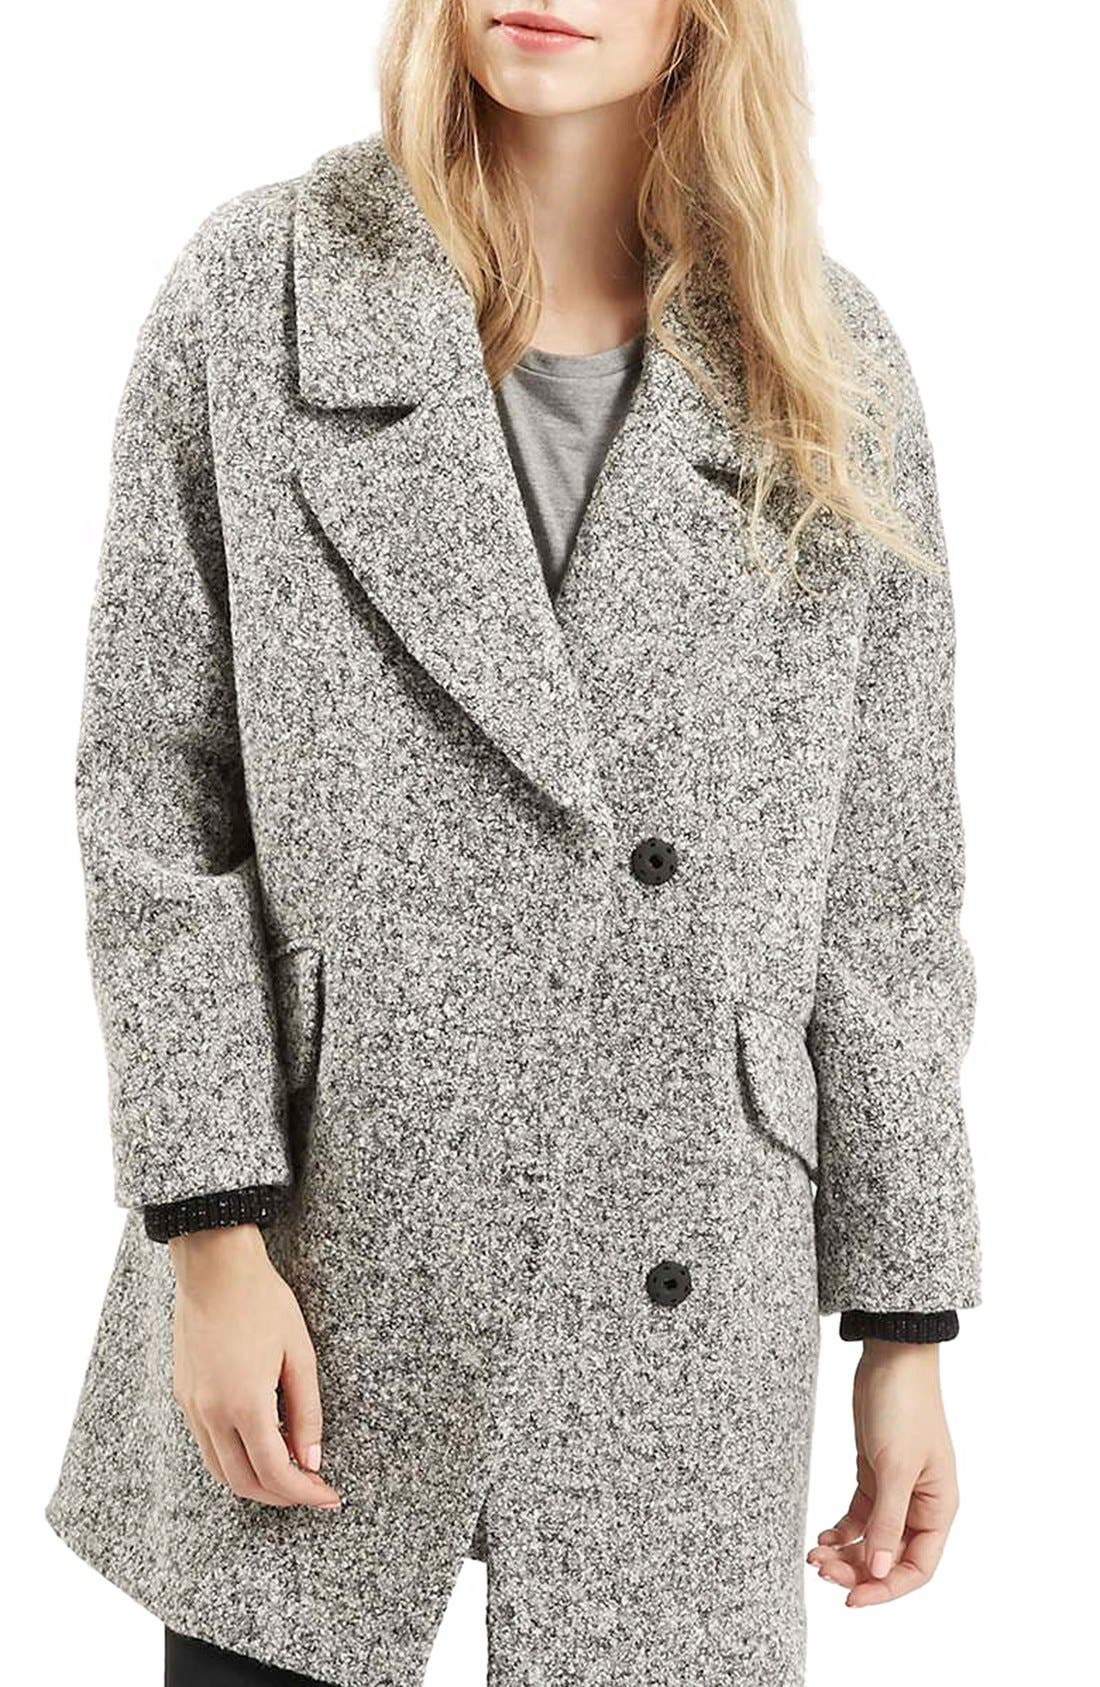 TOPSHOP 'Amelia' Slouch Coat, Main, color, 020